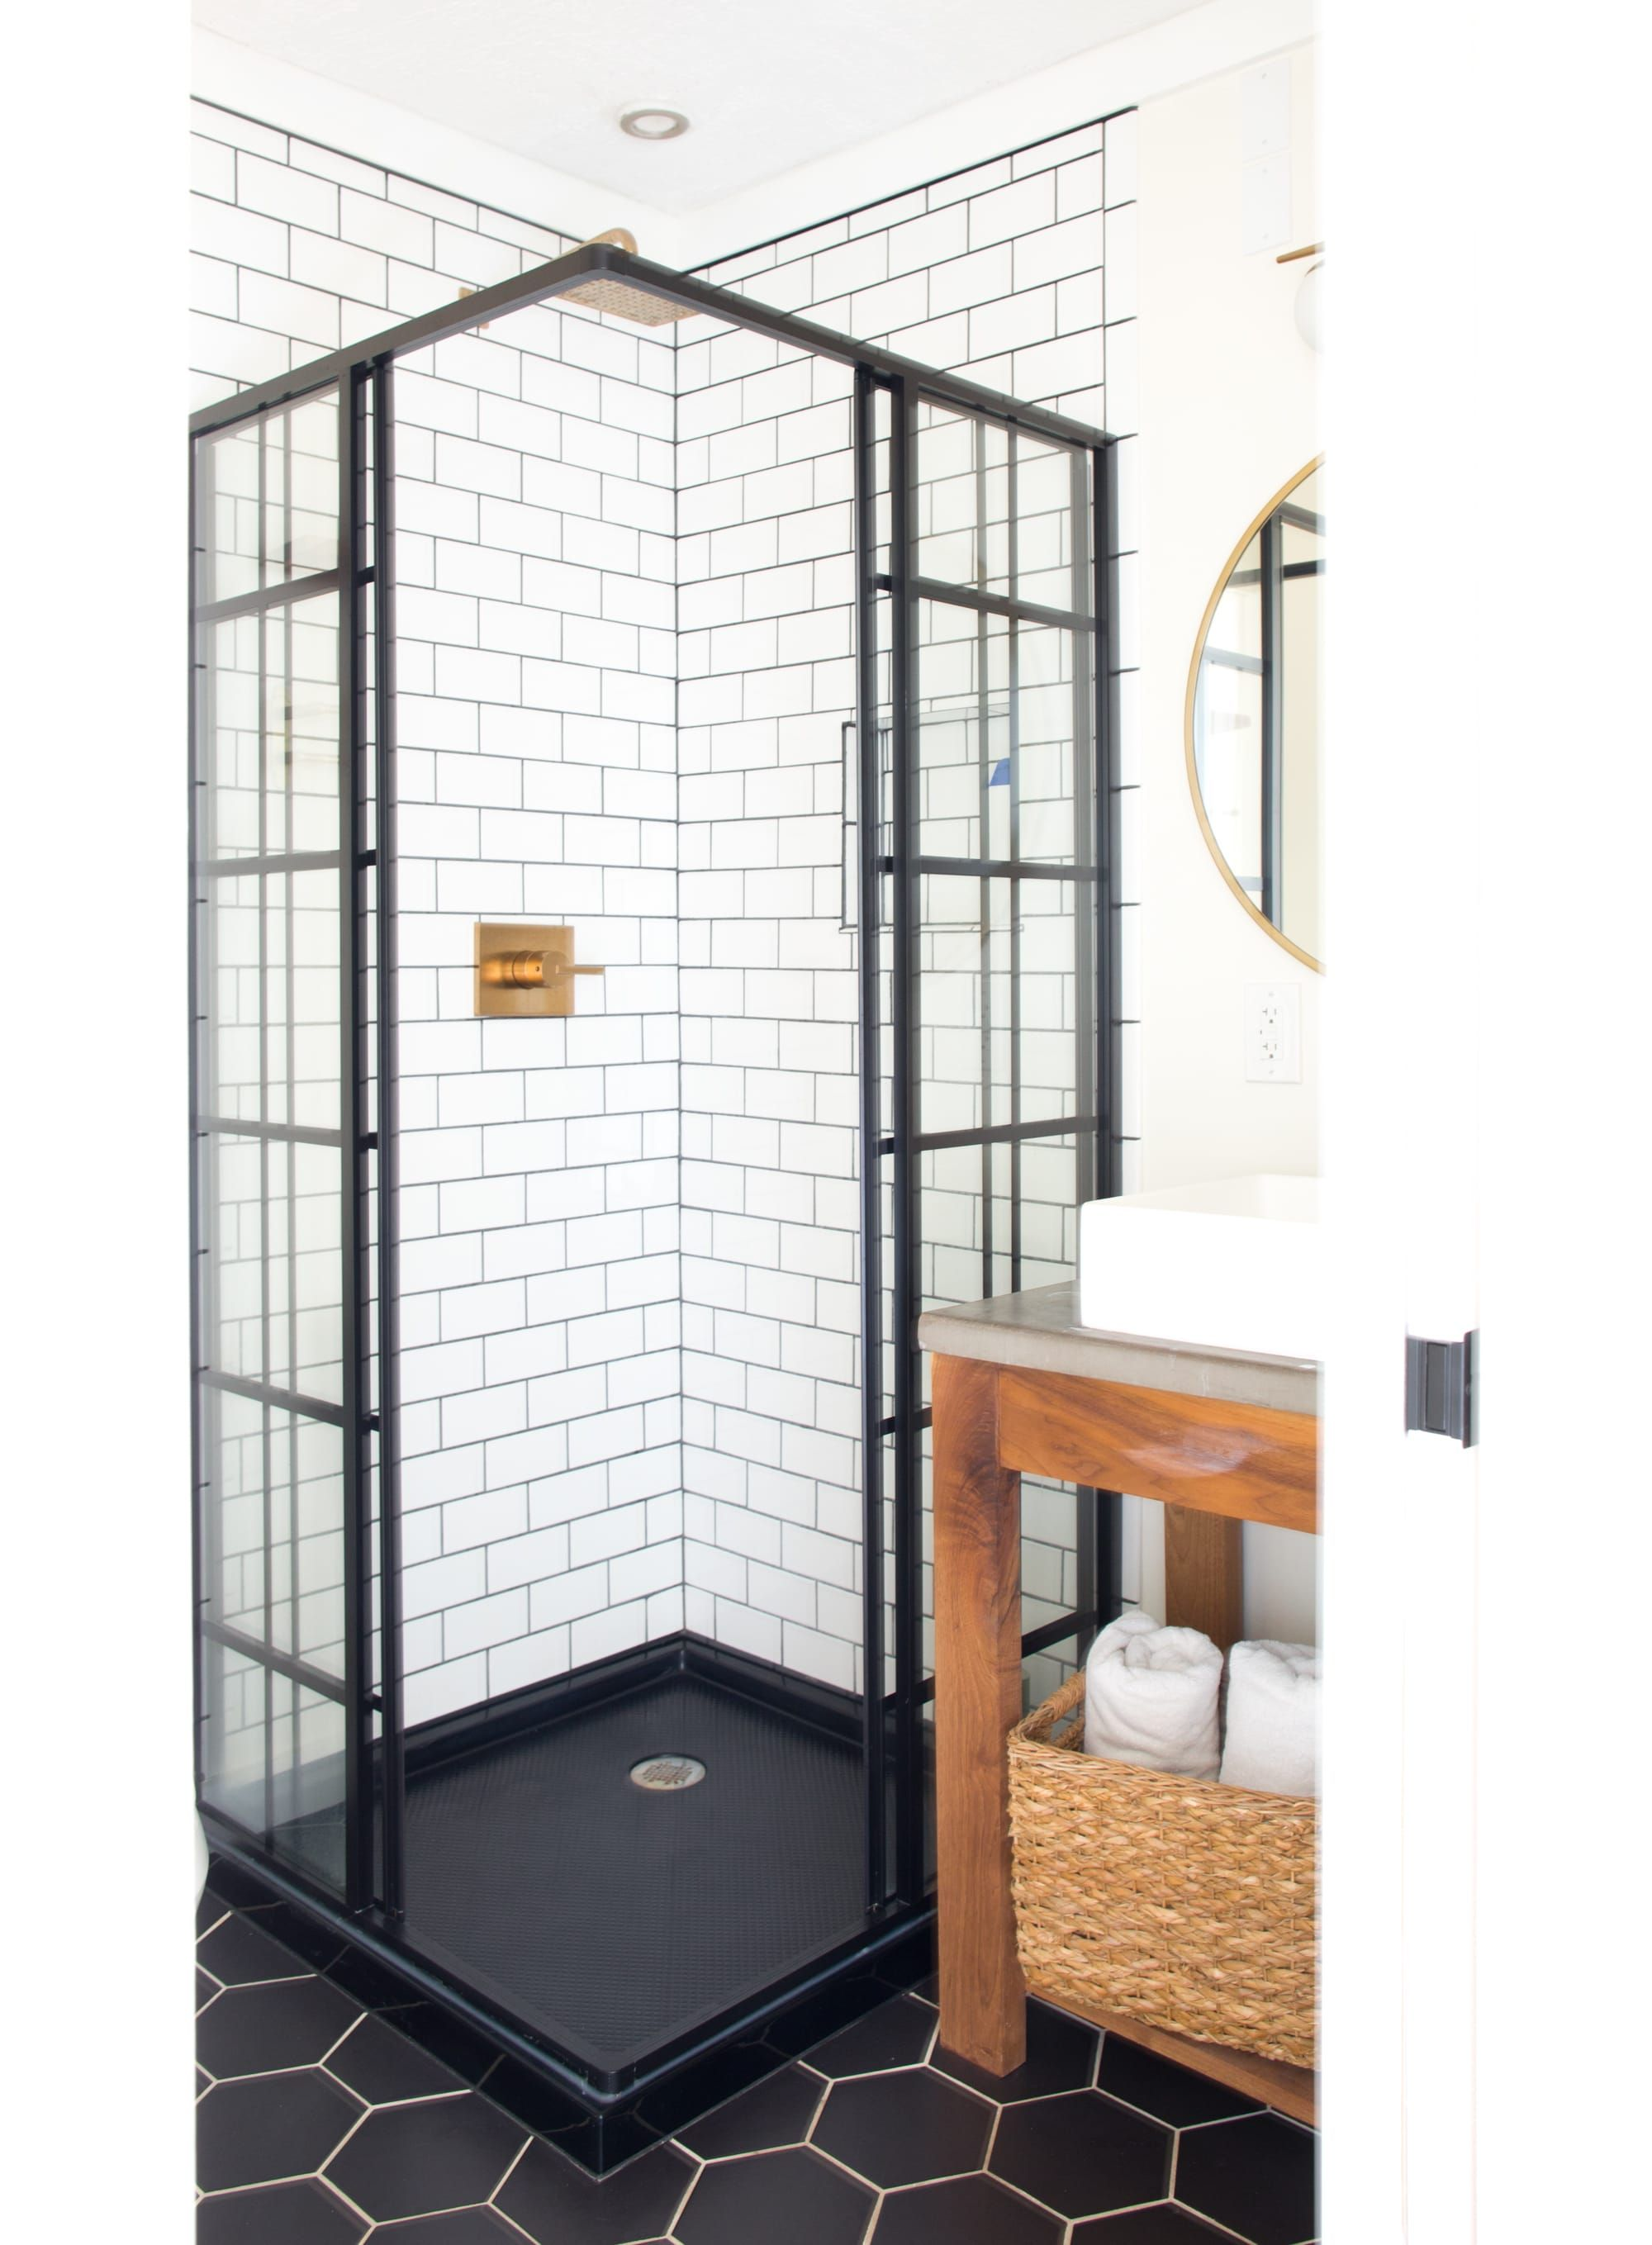 Minimalism Meets Organic Modern In This Michigan Home Bathroom Design Small Bathroom Interior Bathroom Interior Design